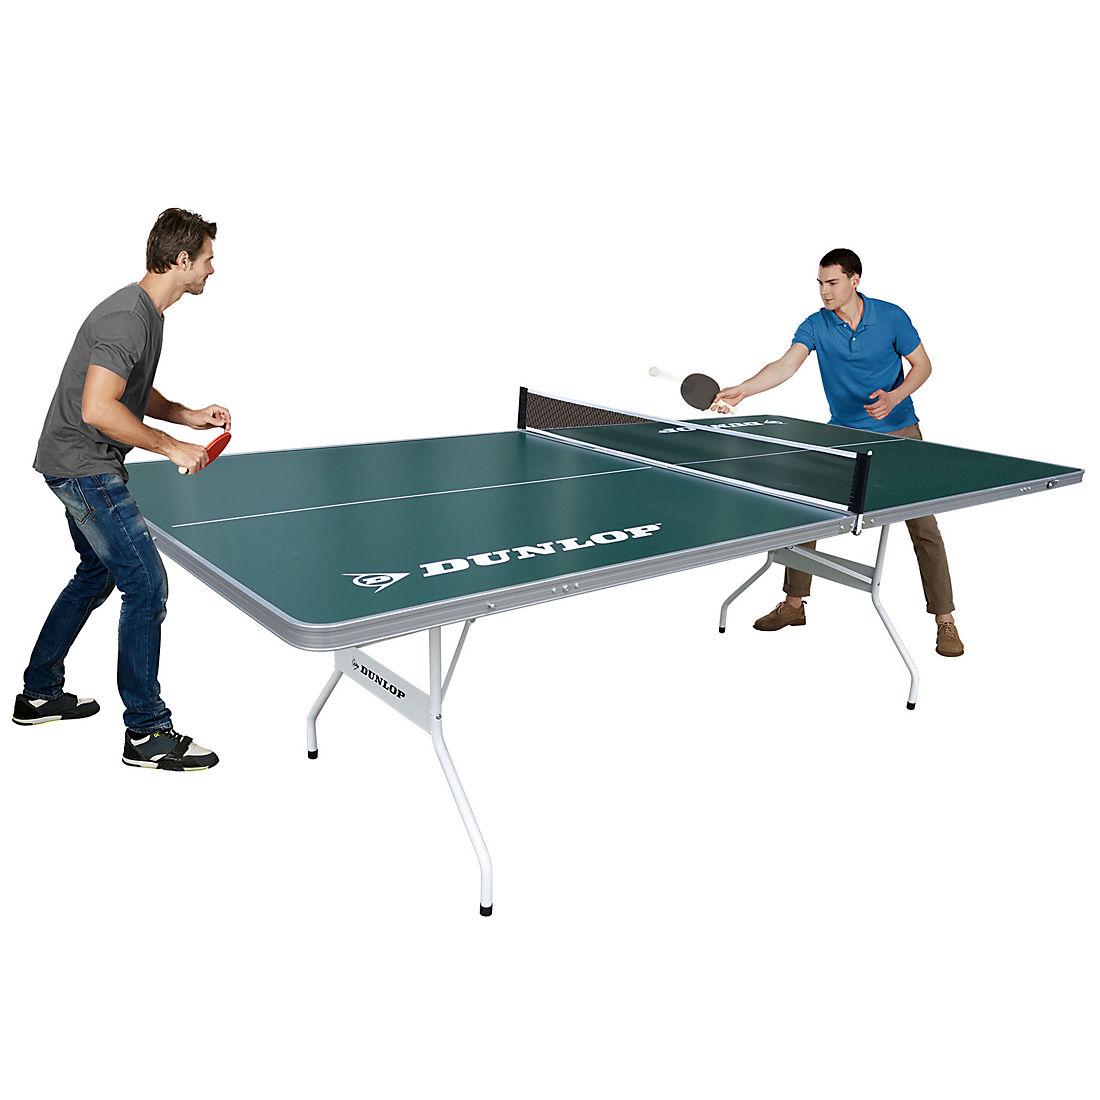 Incredible Dunlop Mid Size Portable Table Tennis Set Download Free Architecture Designs Intelgarnamadebymaigaardcom